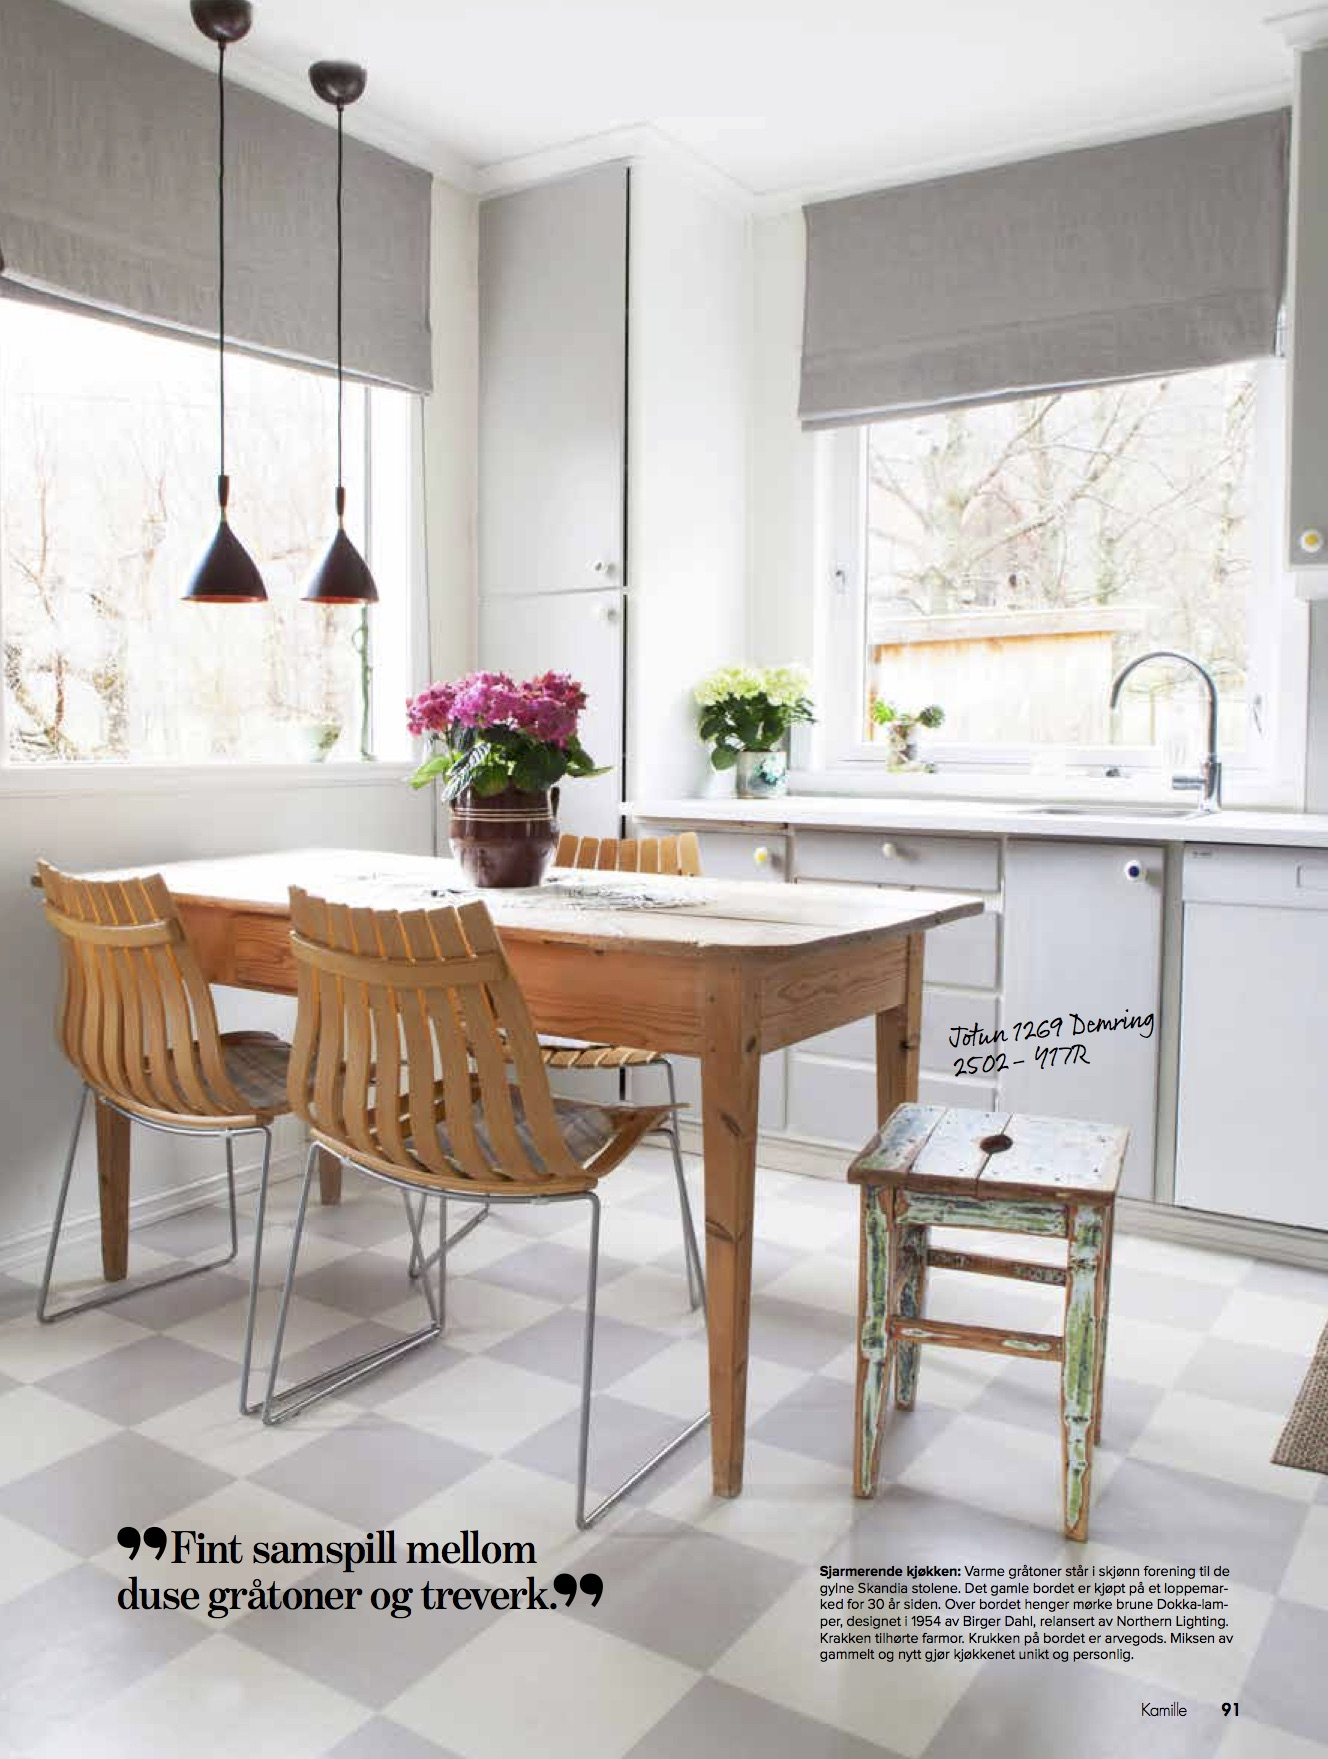 Rosendal, Signe Schineller, interiør, interior, interiorstyling, Signe Rosendal